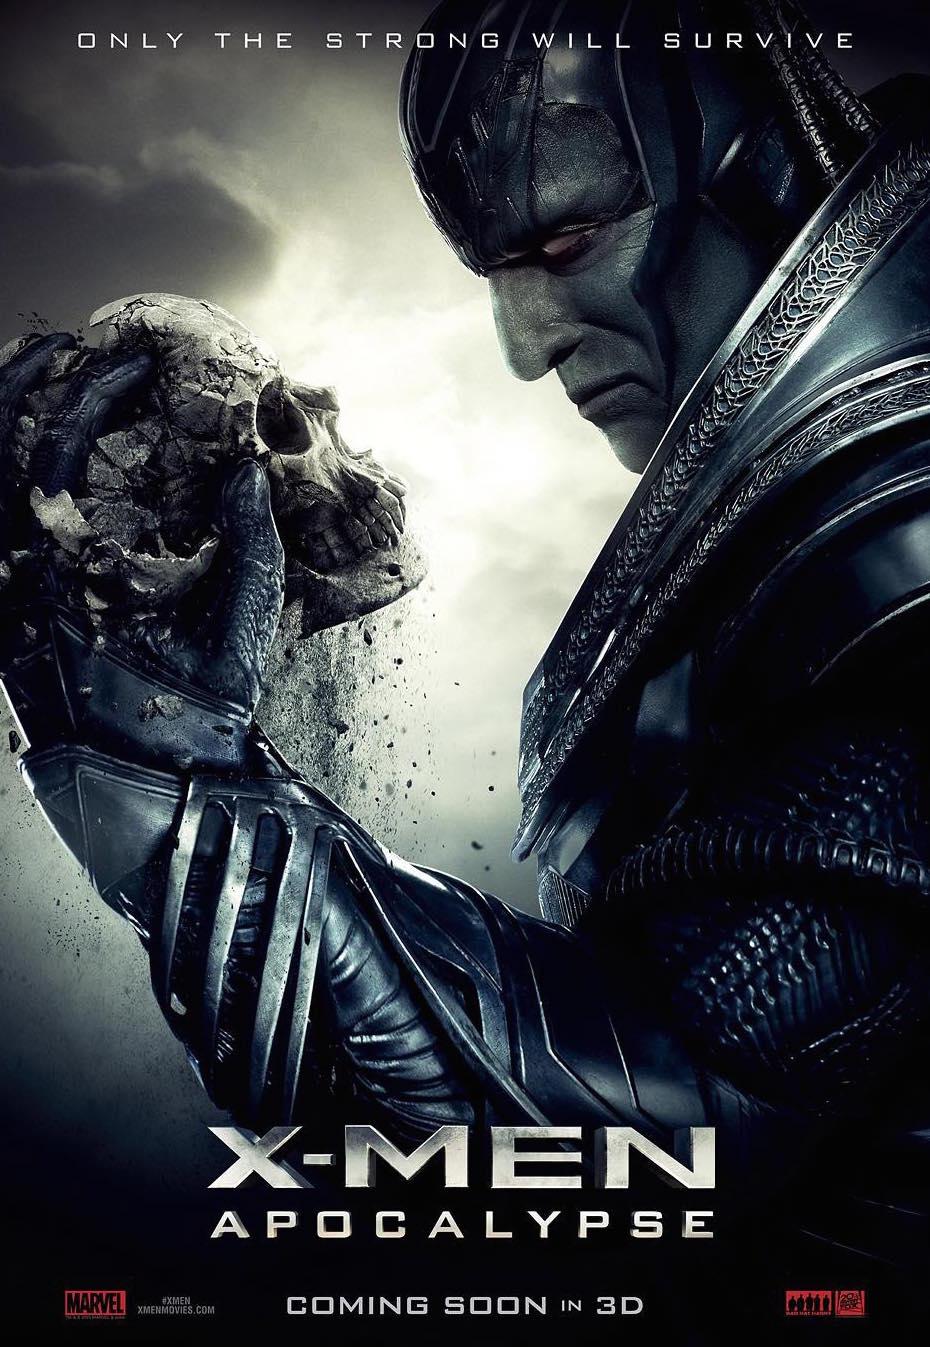 X-MEN-APOCALYPSE-3D-poster